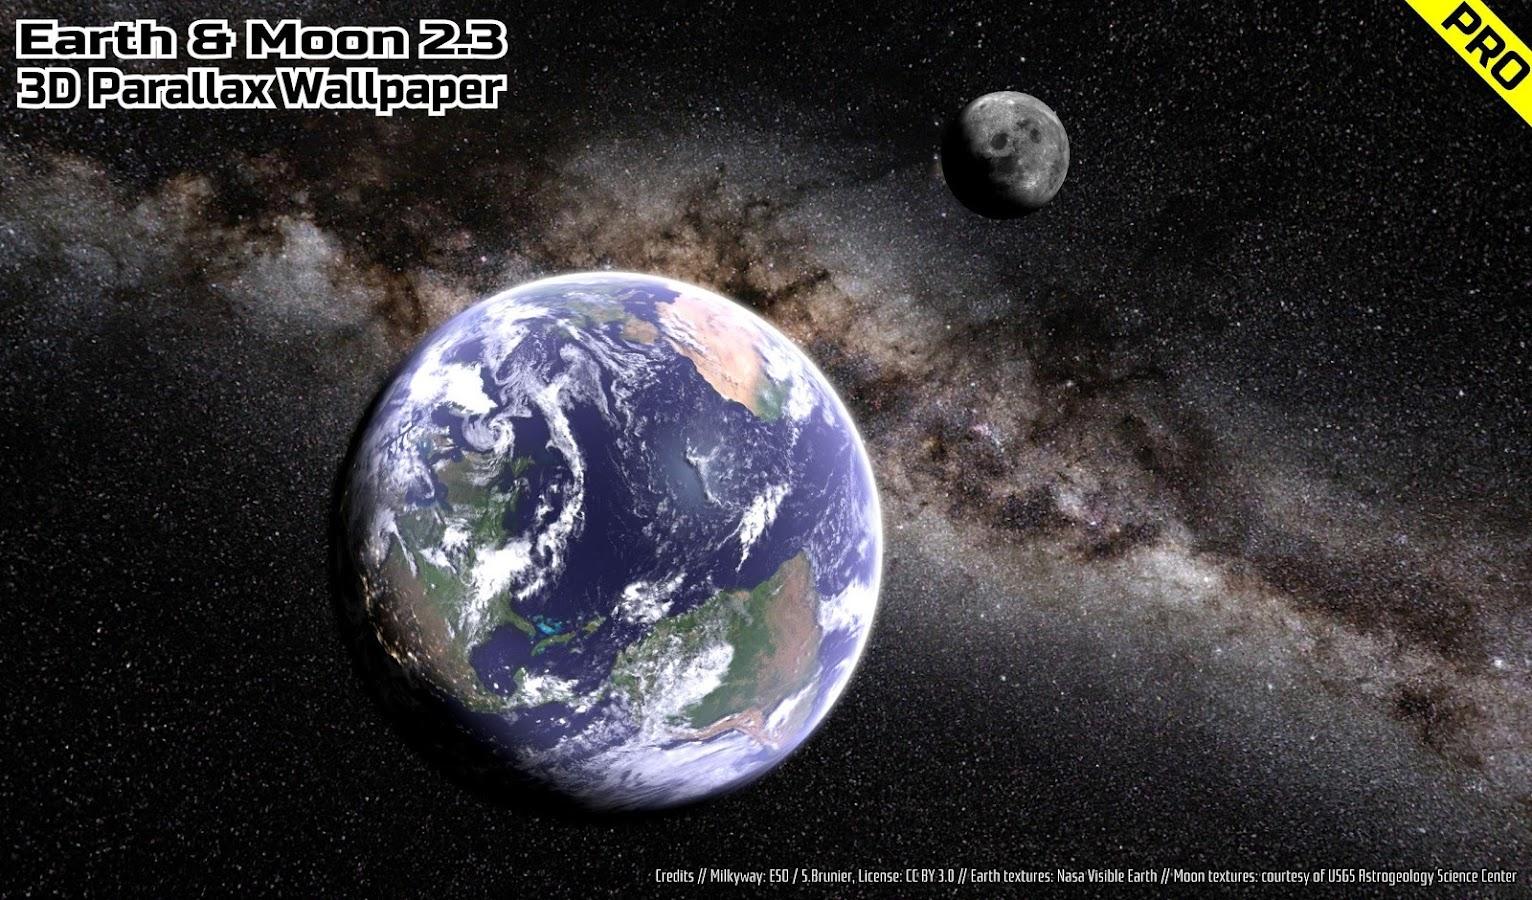 Parallax 3d Effect Wallpaper Pro Earth Amp Moon In Hd Gyro 3d Pro Parallax Wallpaper